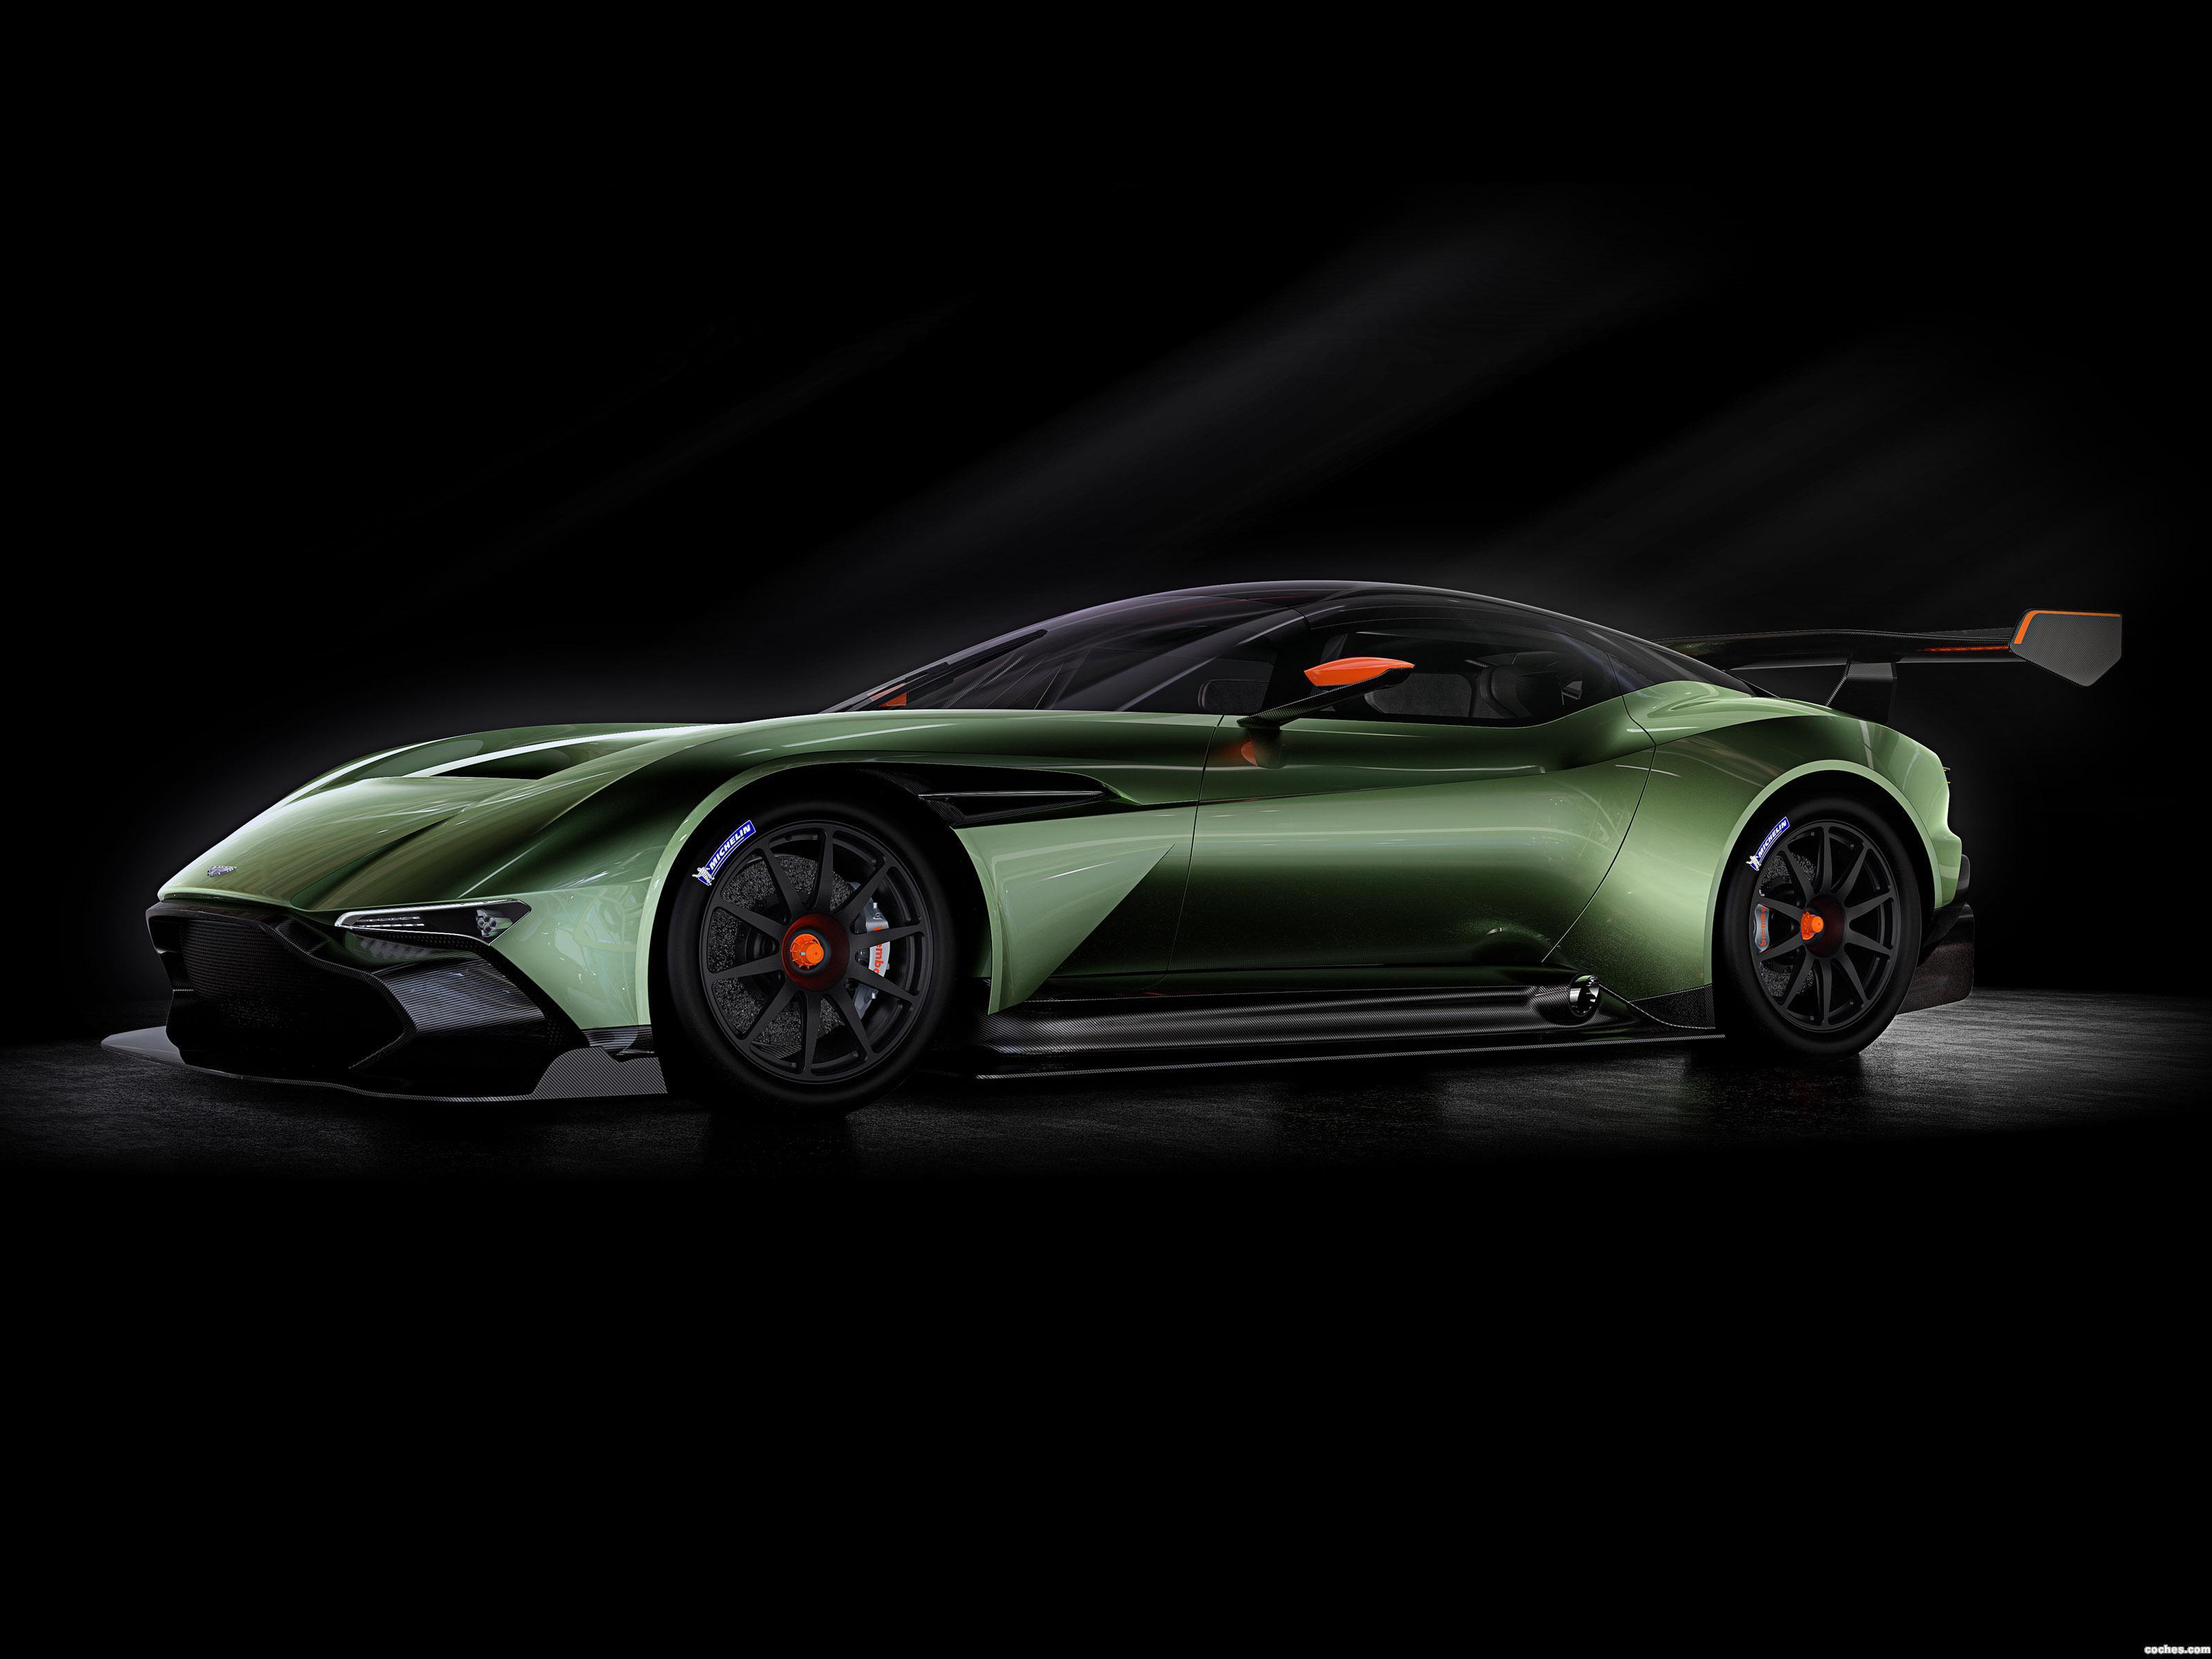 Foto 7 de Aston Martin Vulcan 2015